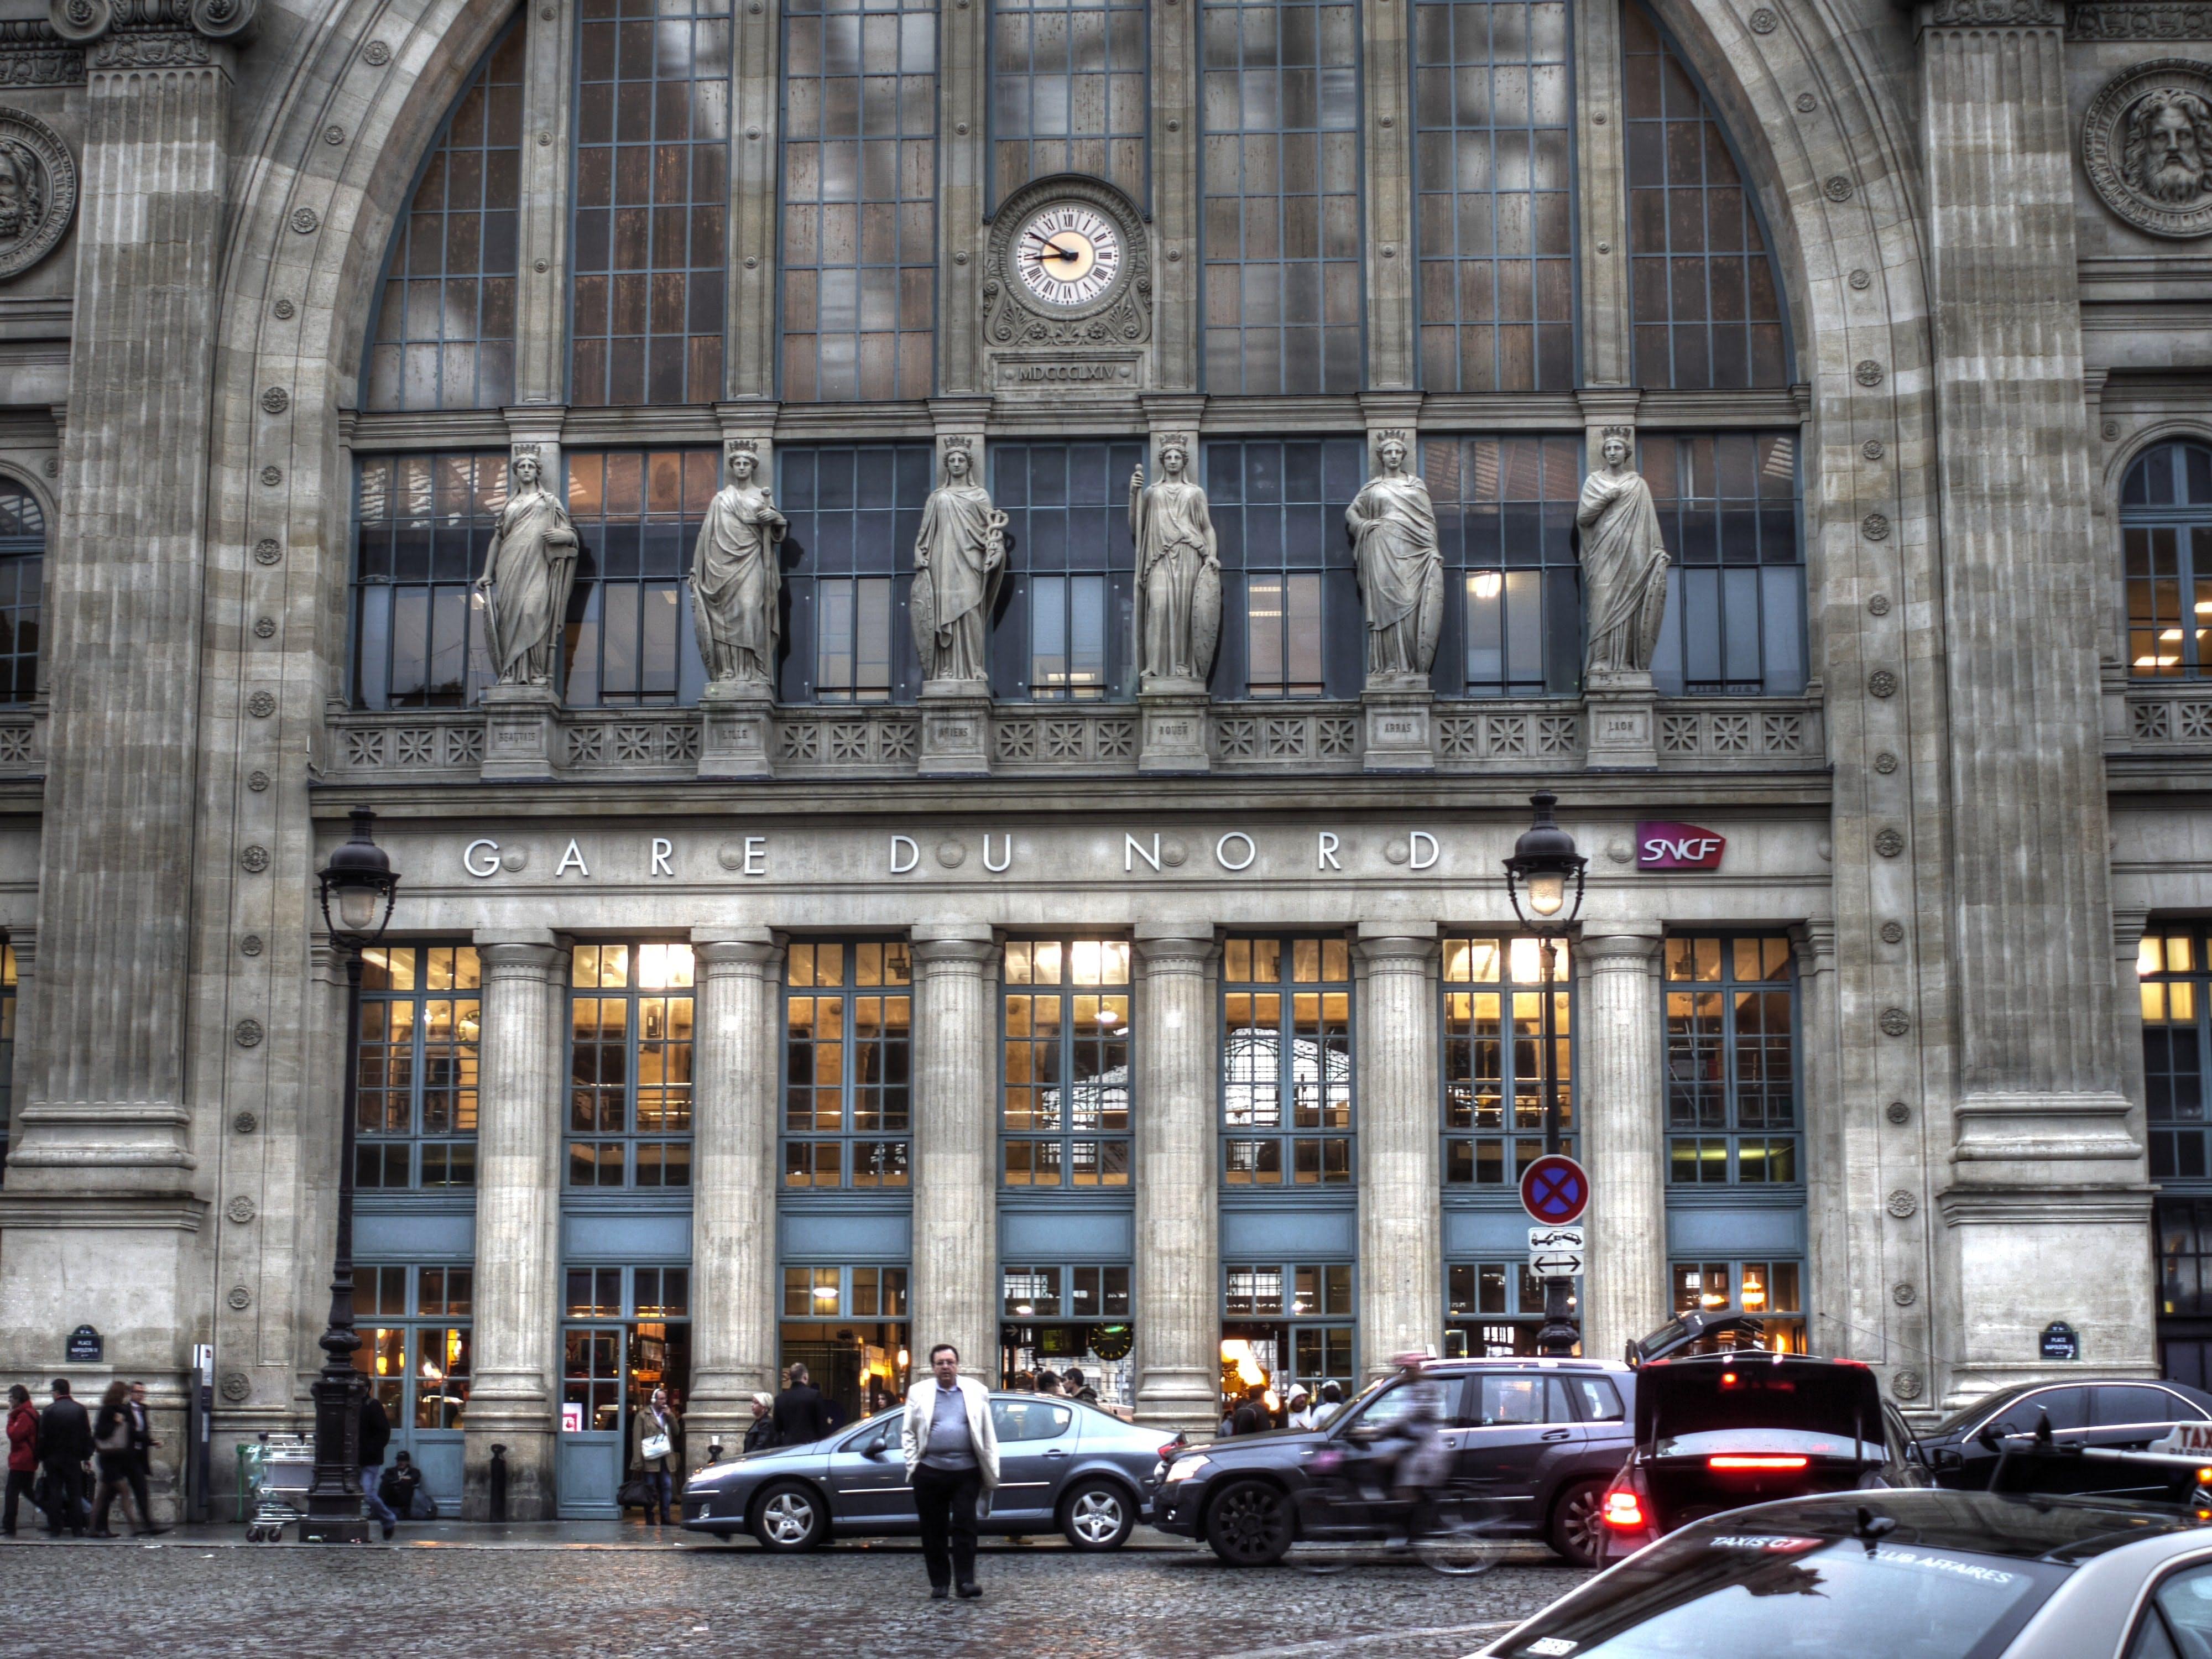 Entrance to Gare du Nord station, Paris